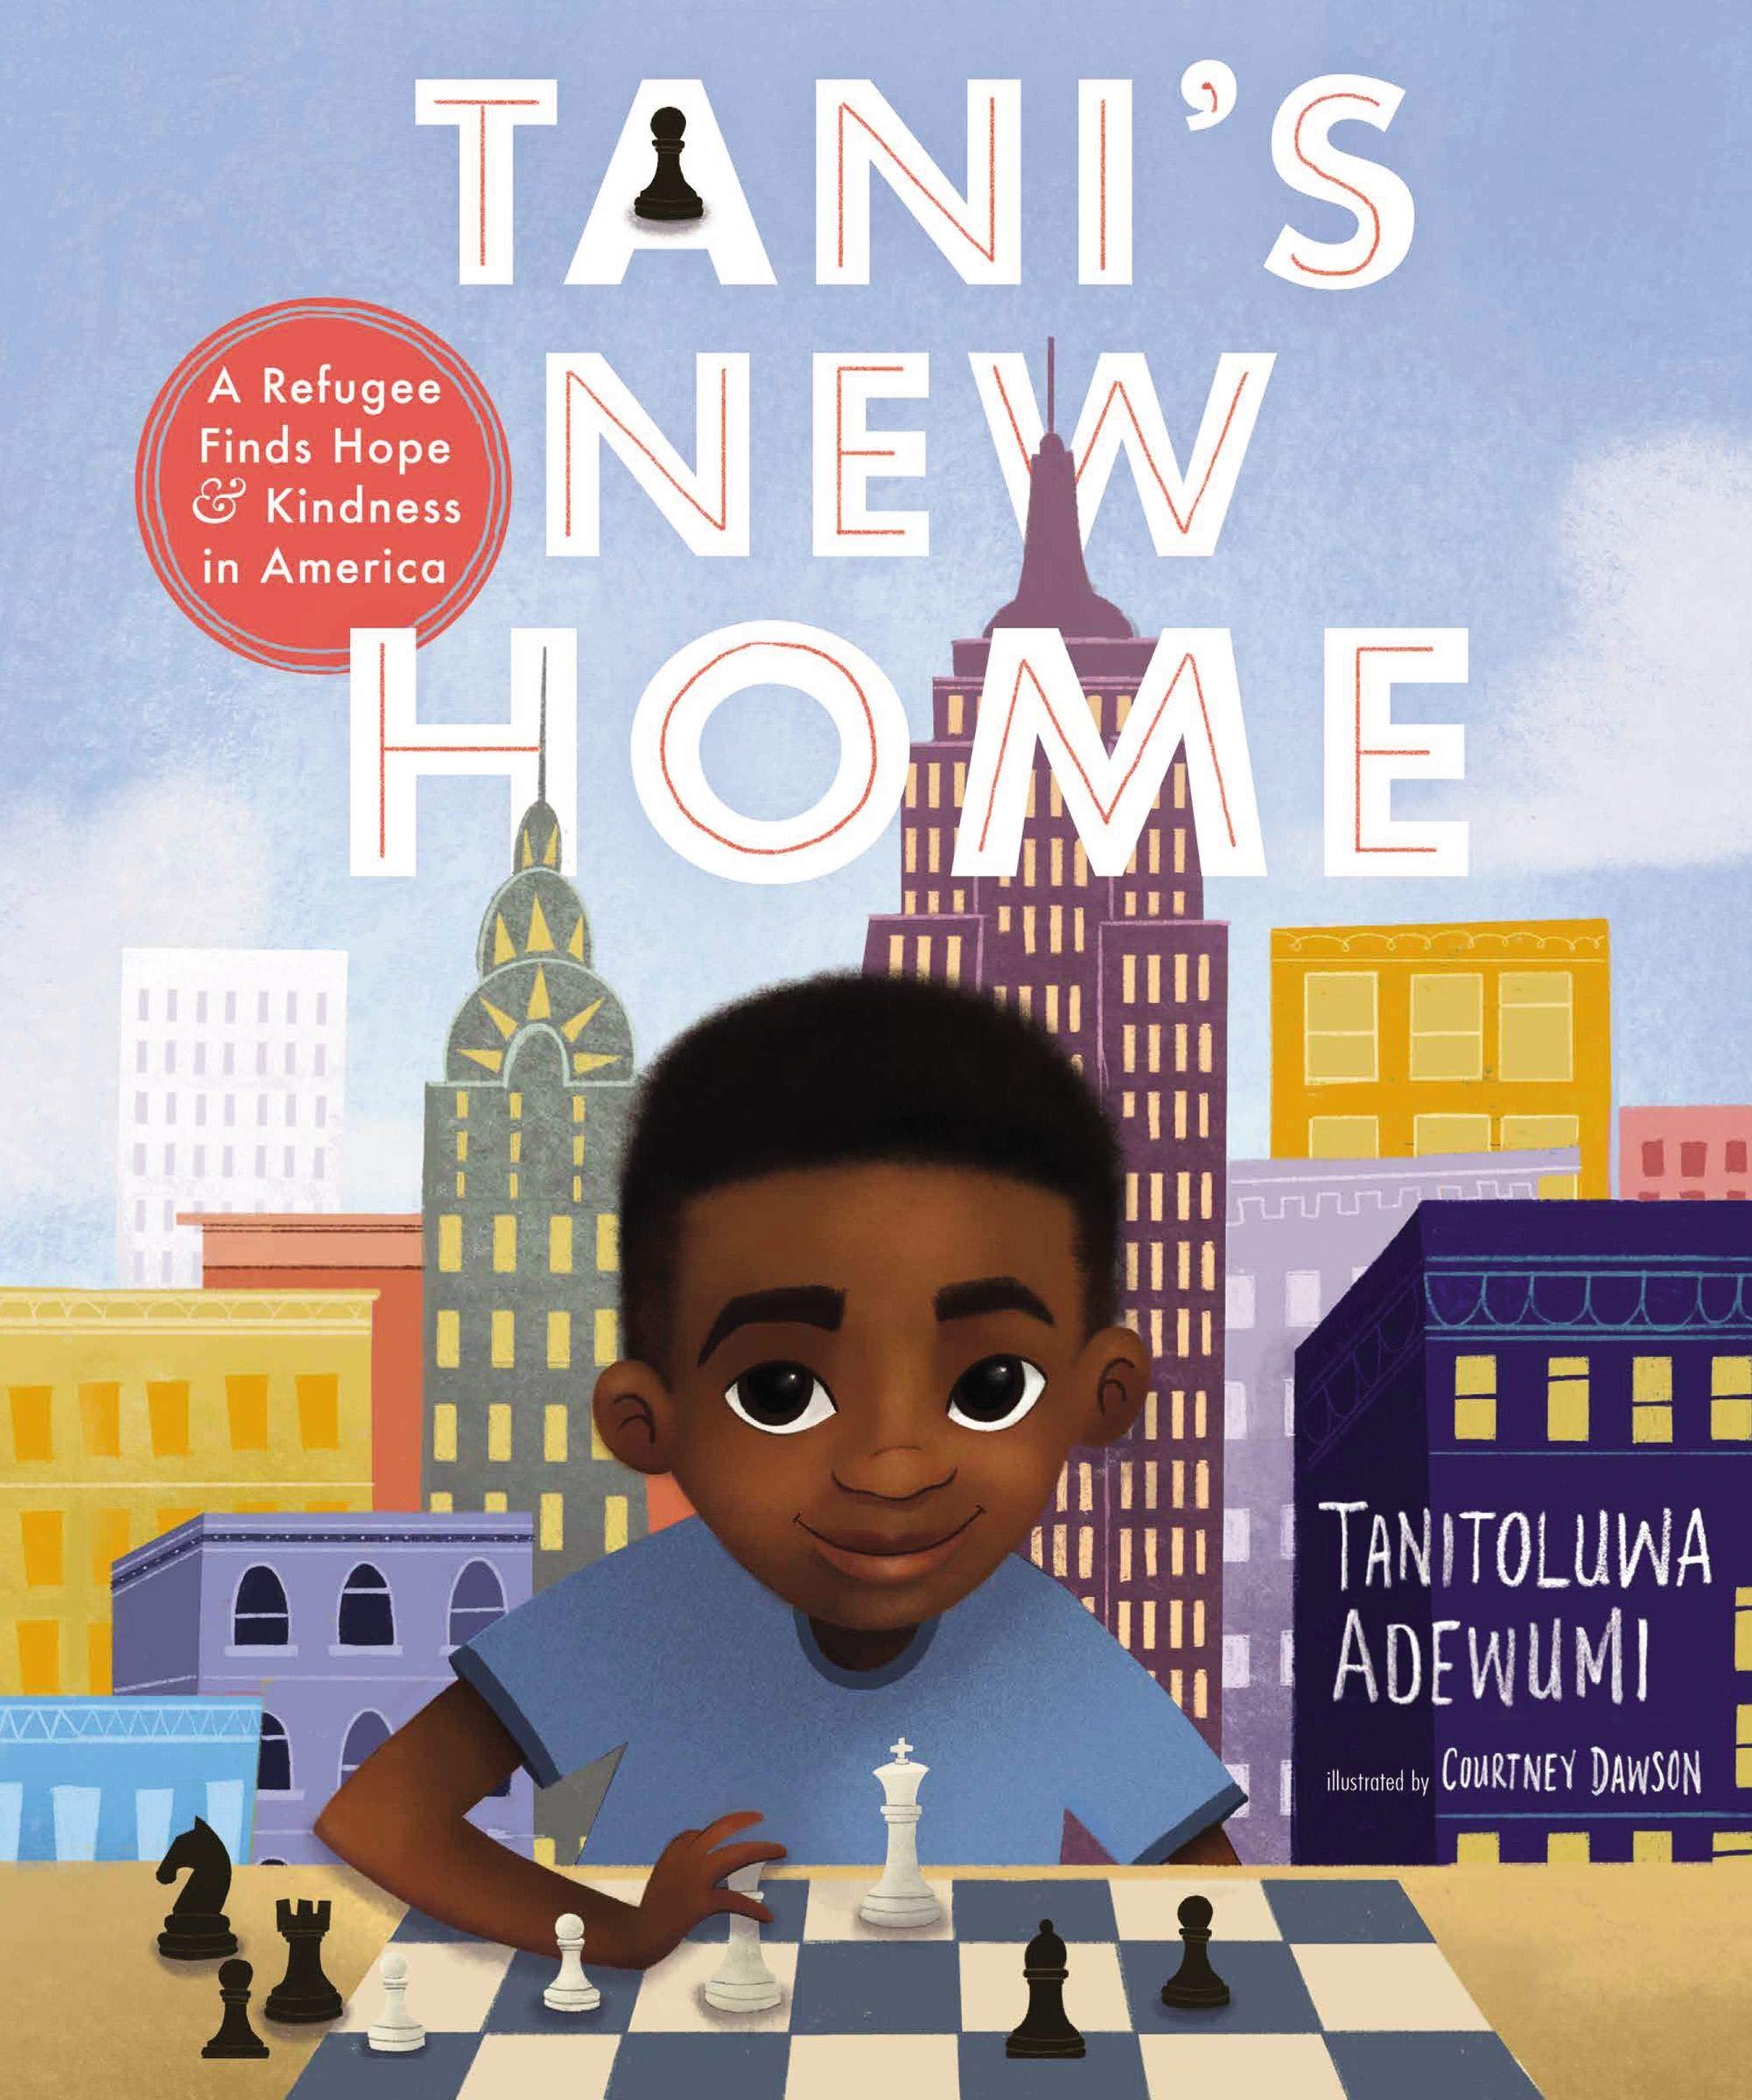 Tani's New Home: A Refugee Finds Hope and Kindness in America: Adewumi,  Tanitoluwa, Dawson, Courtney: 9781400218288: Amazon.com: Books